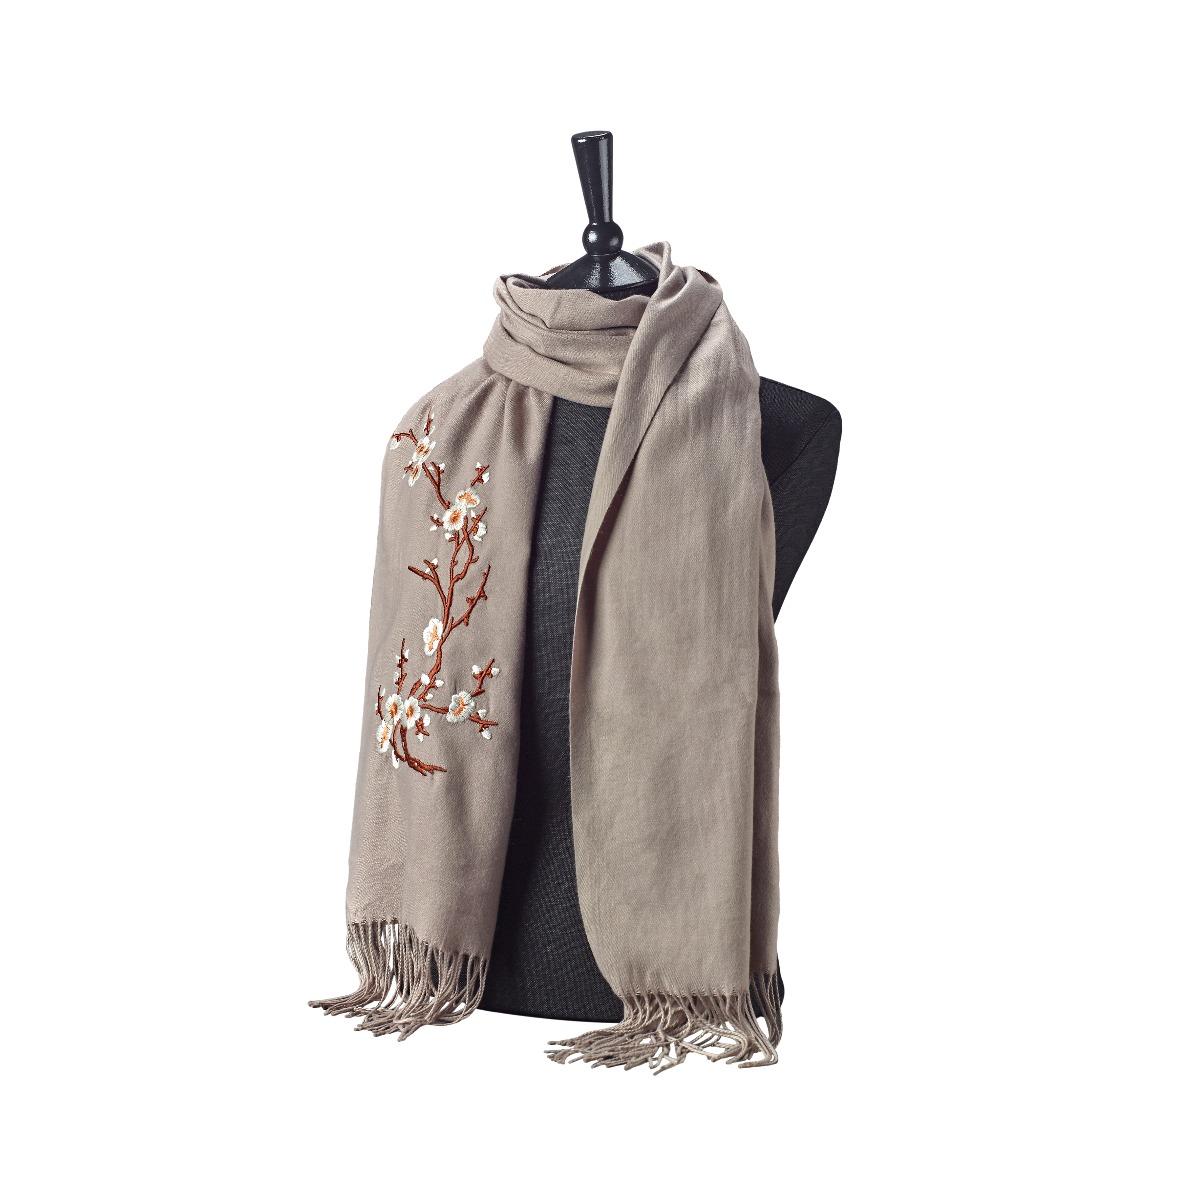 Cherry blossom scarf (beige)